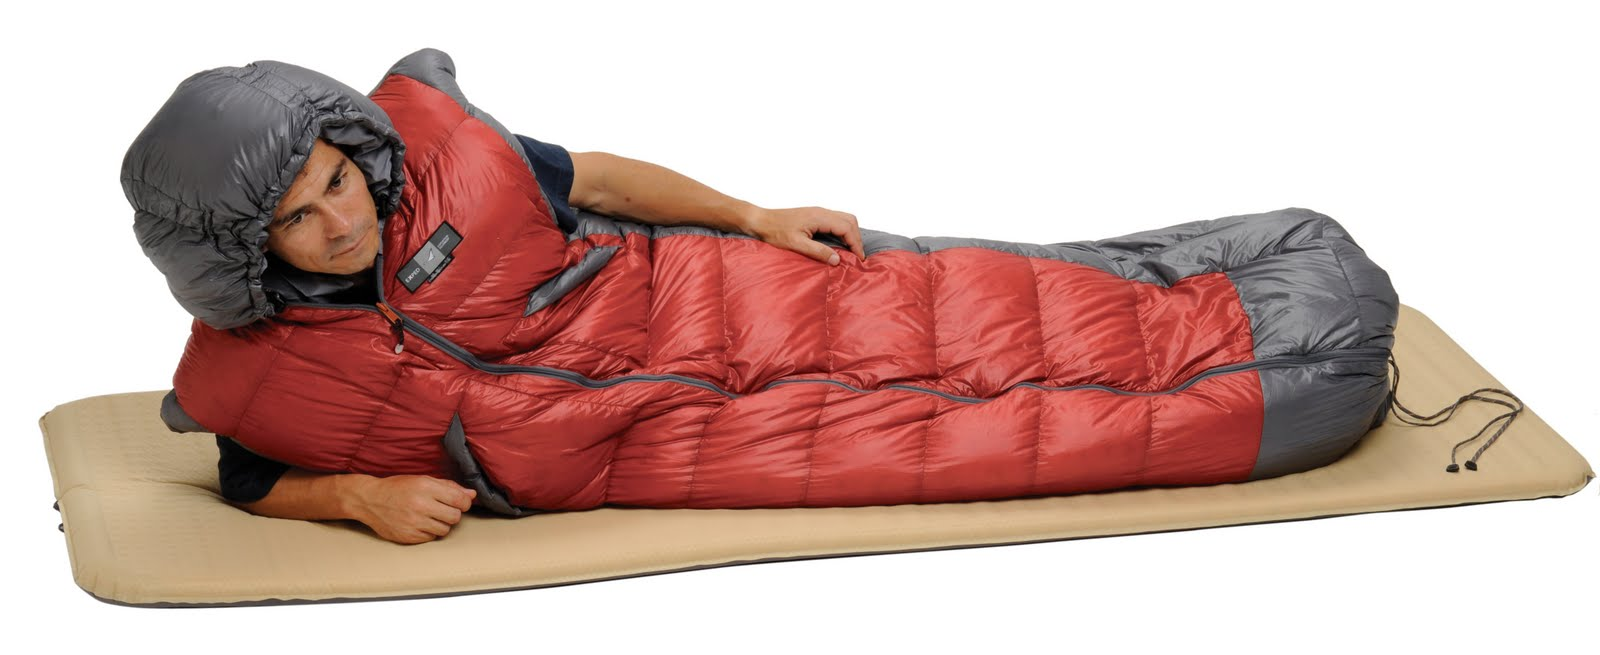 Exped Dreamwalker Sleeping Bags Reviewed In Seattle Times